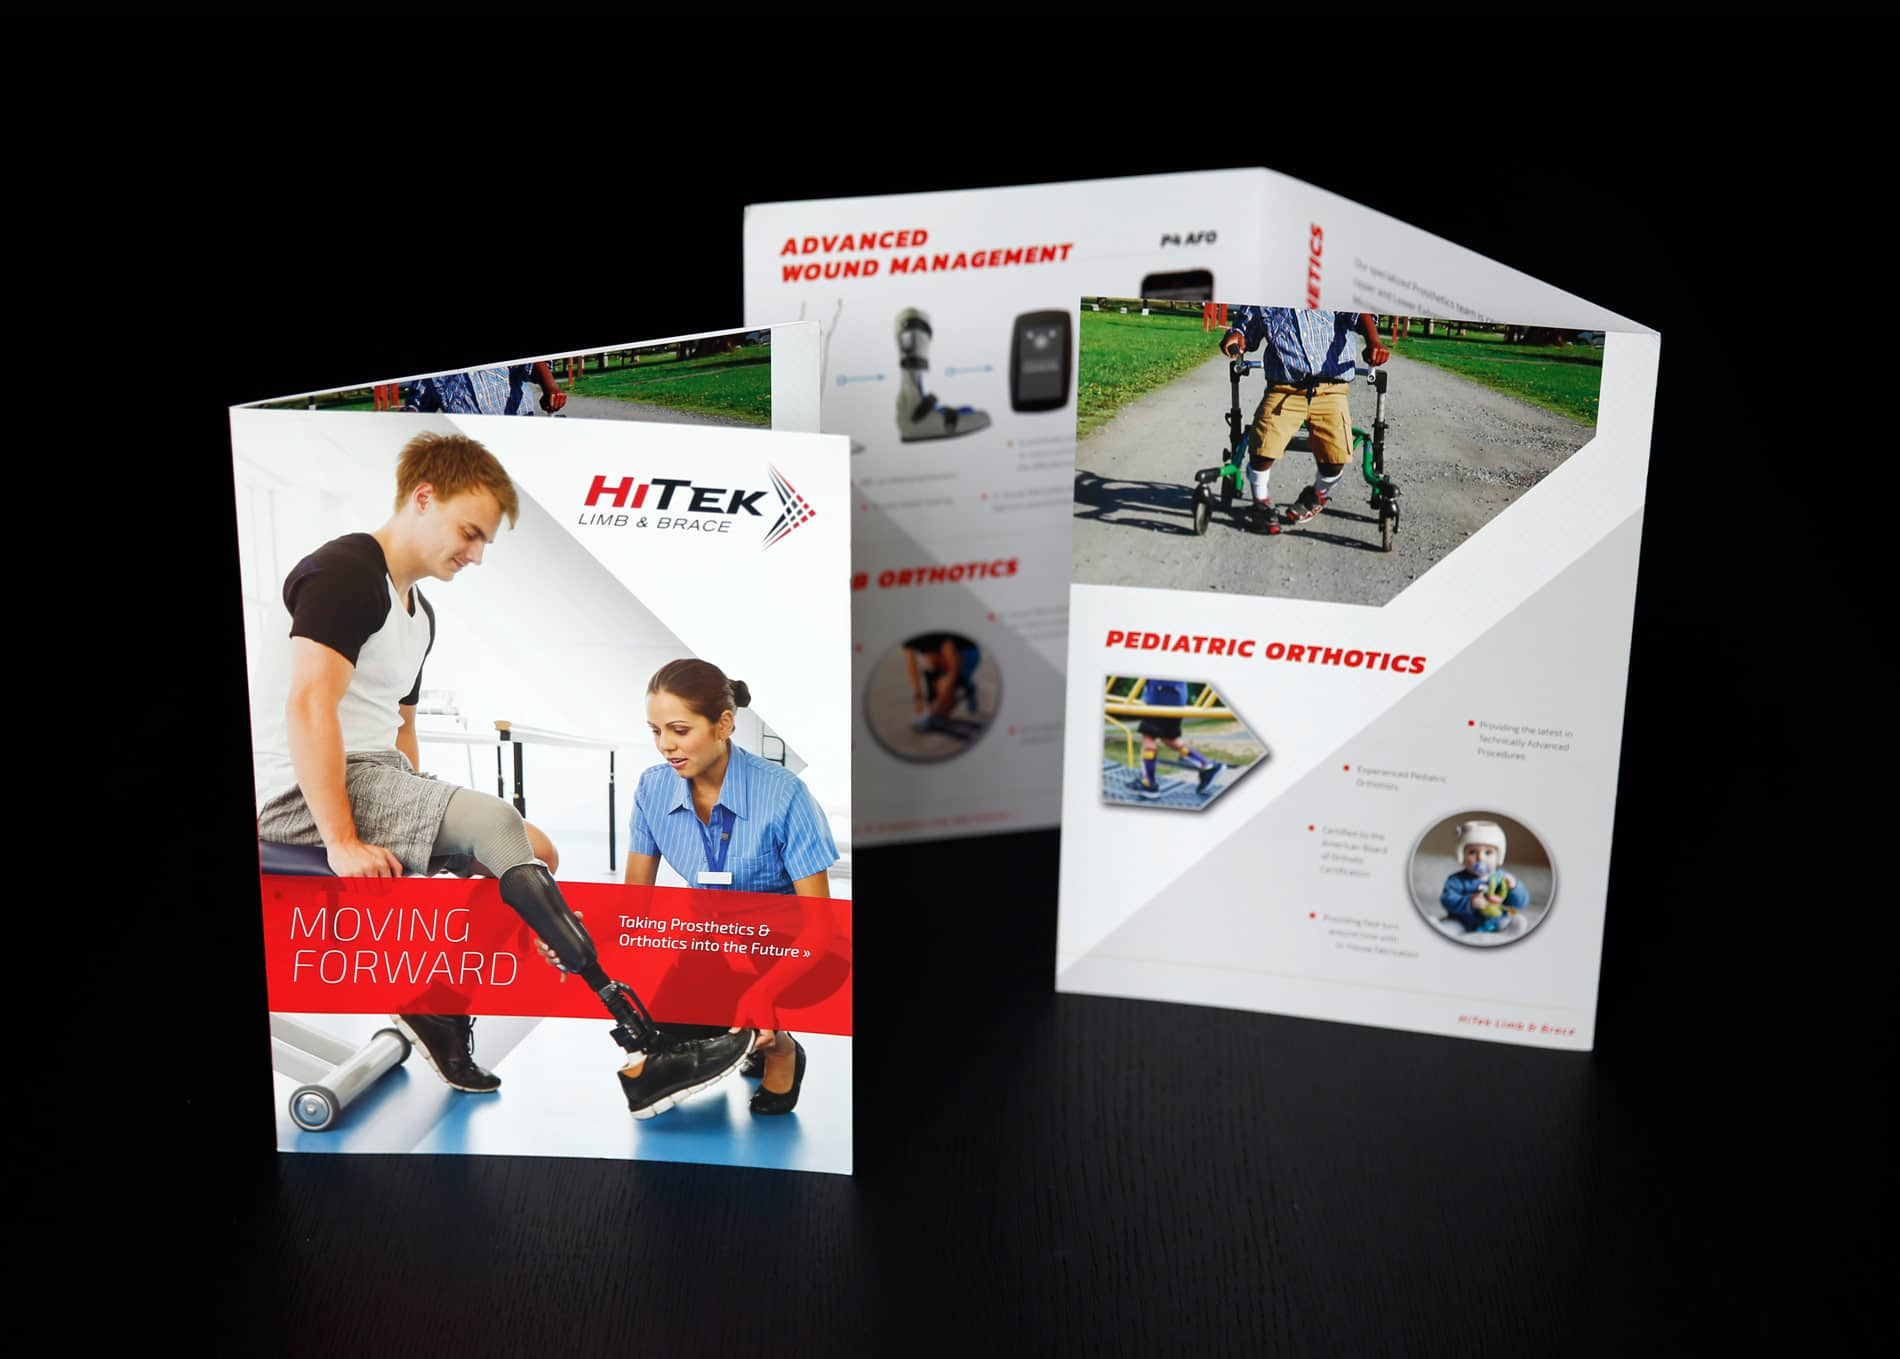 HiTek Limb & Brace Trifold Brochure design